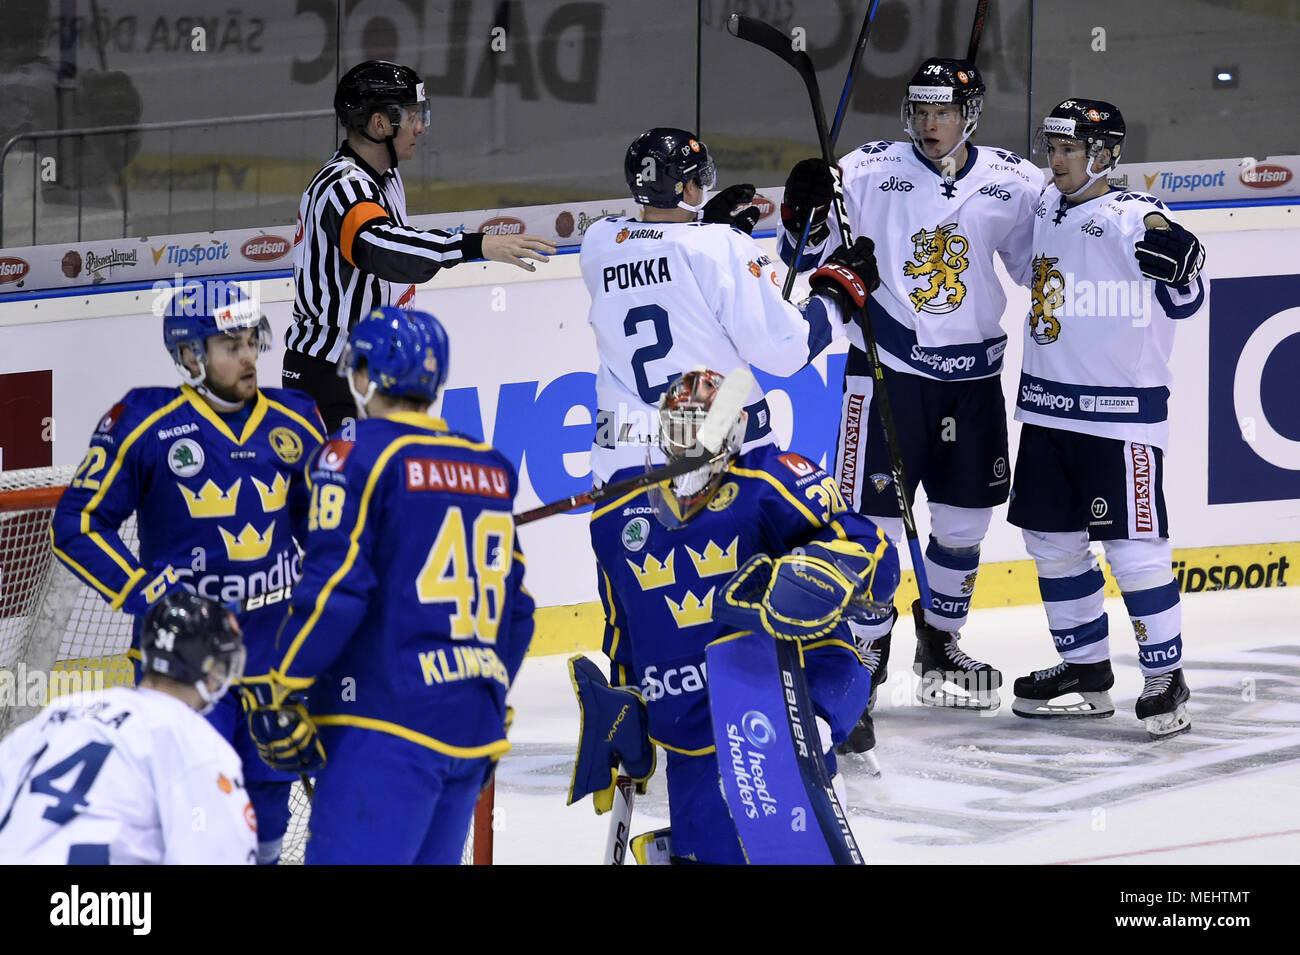 Pardubice Czech Republic 22nd Apr 2018 Ice Hockey Players Of